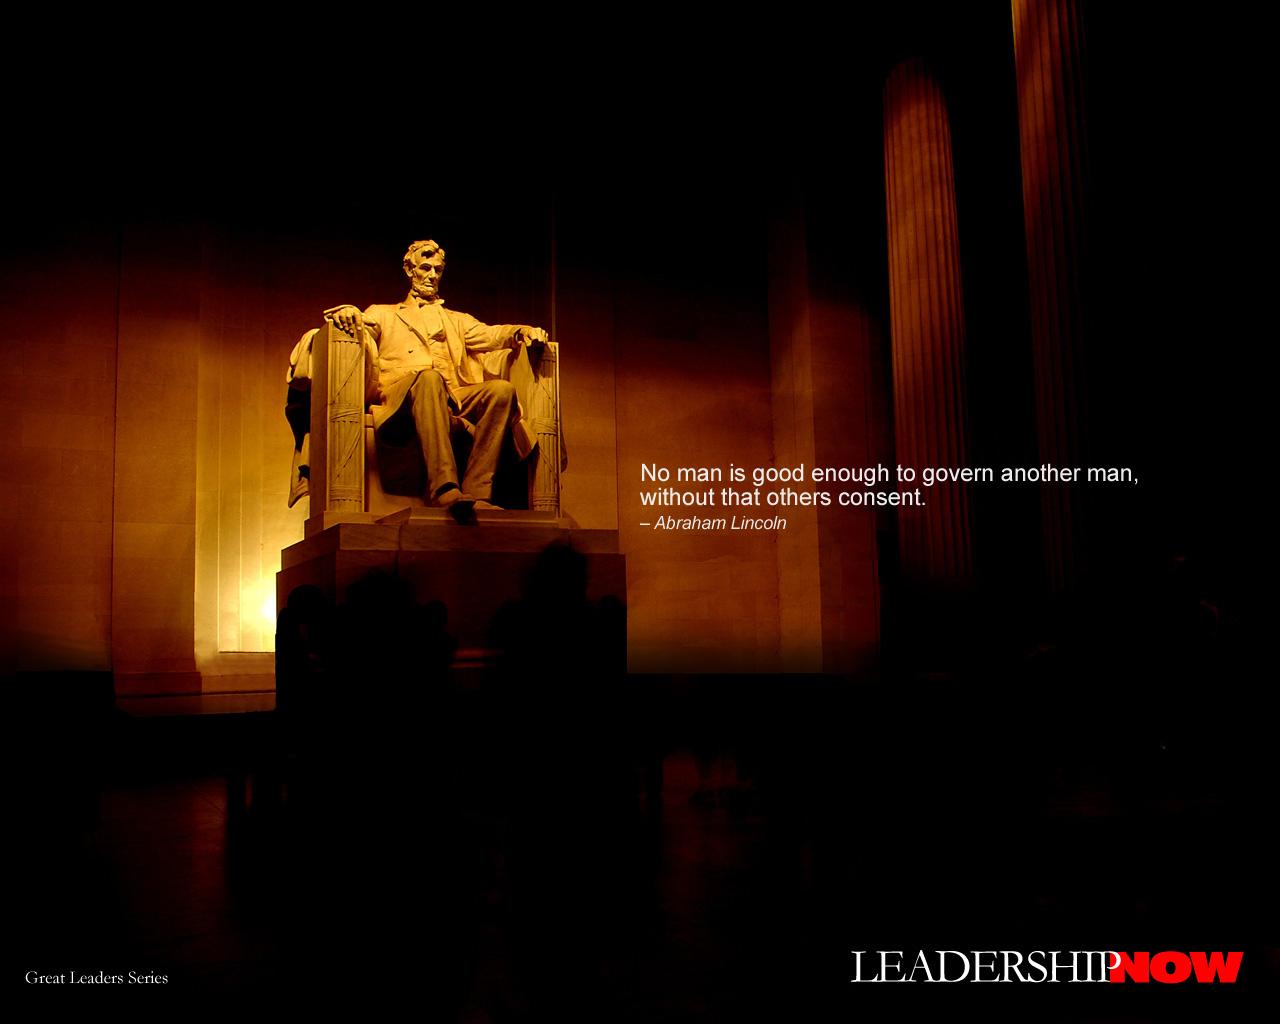 LeadershipNow Wallpapers Downloads 1280x1024